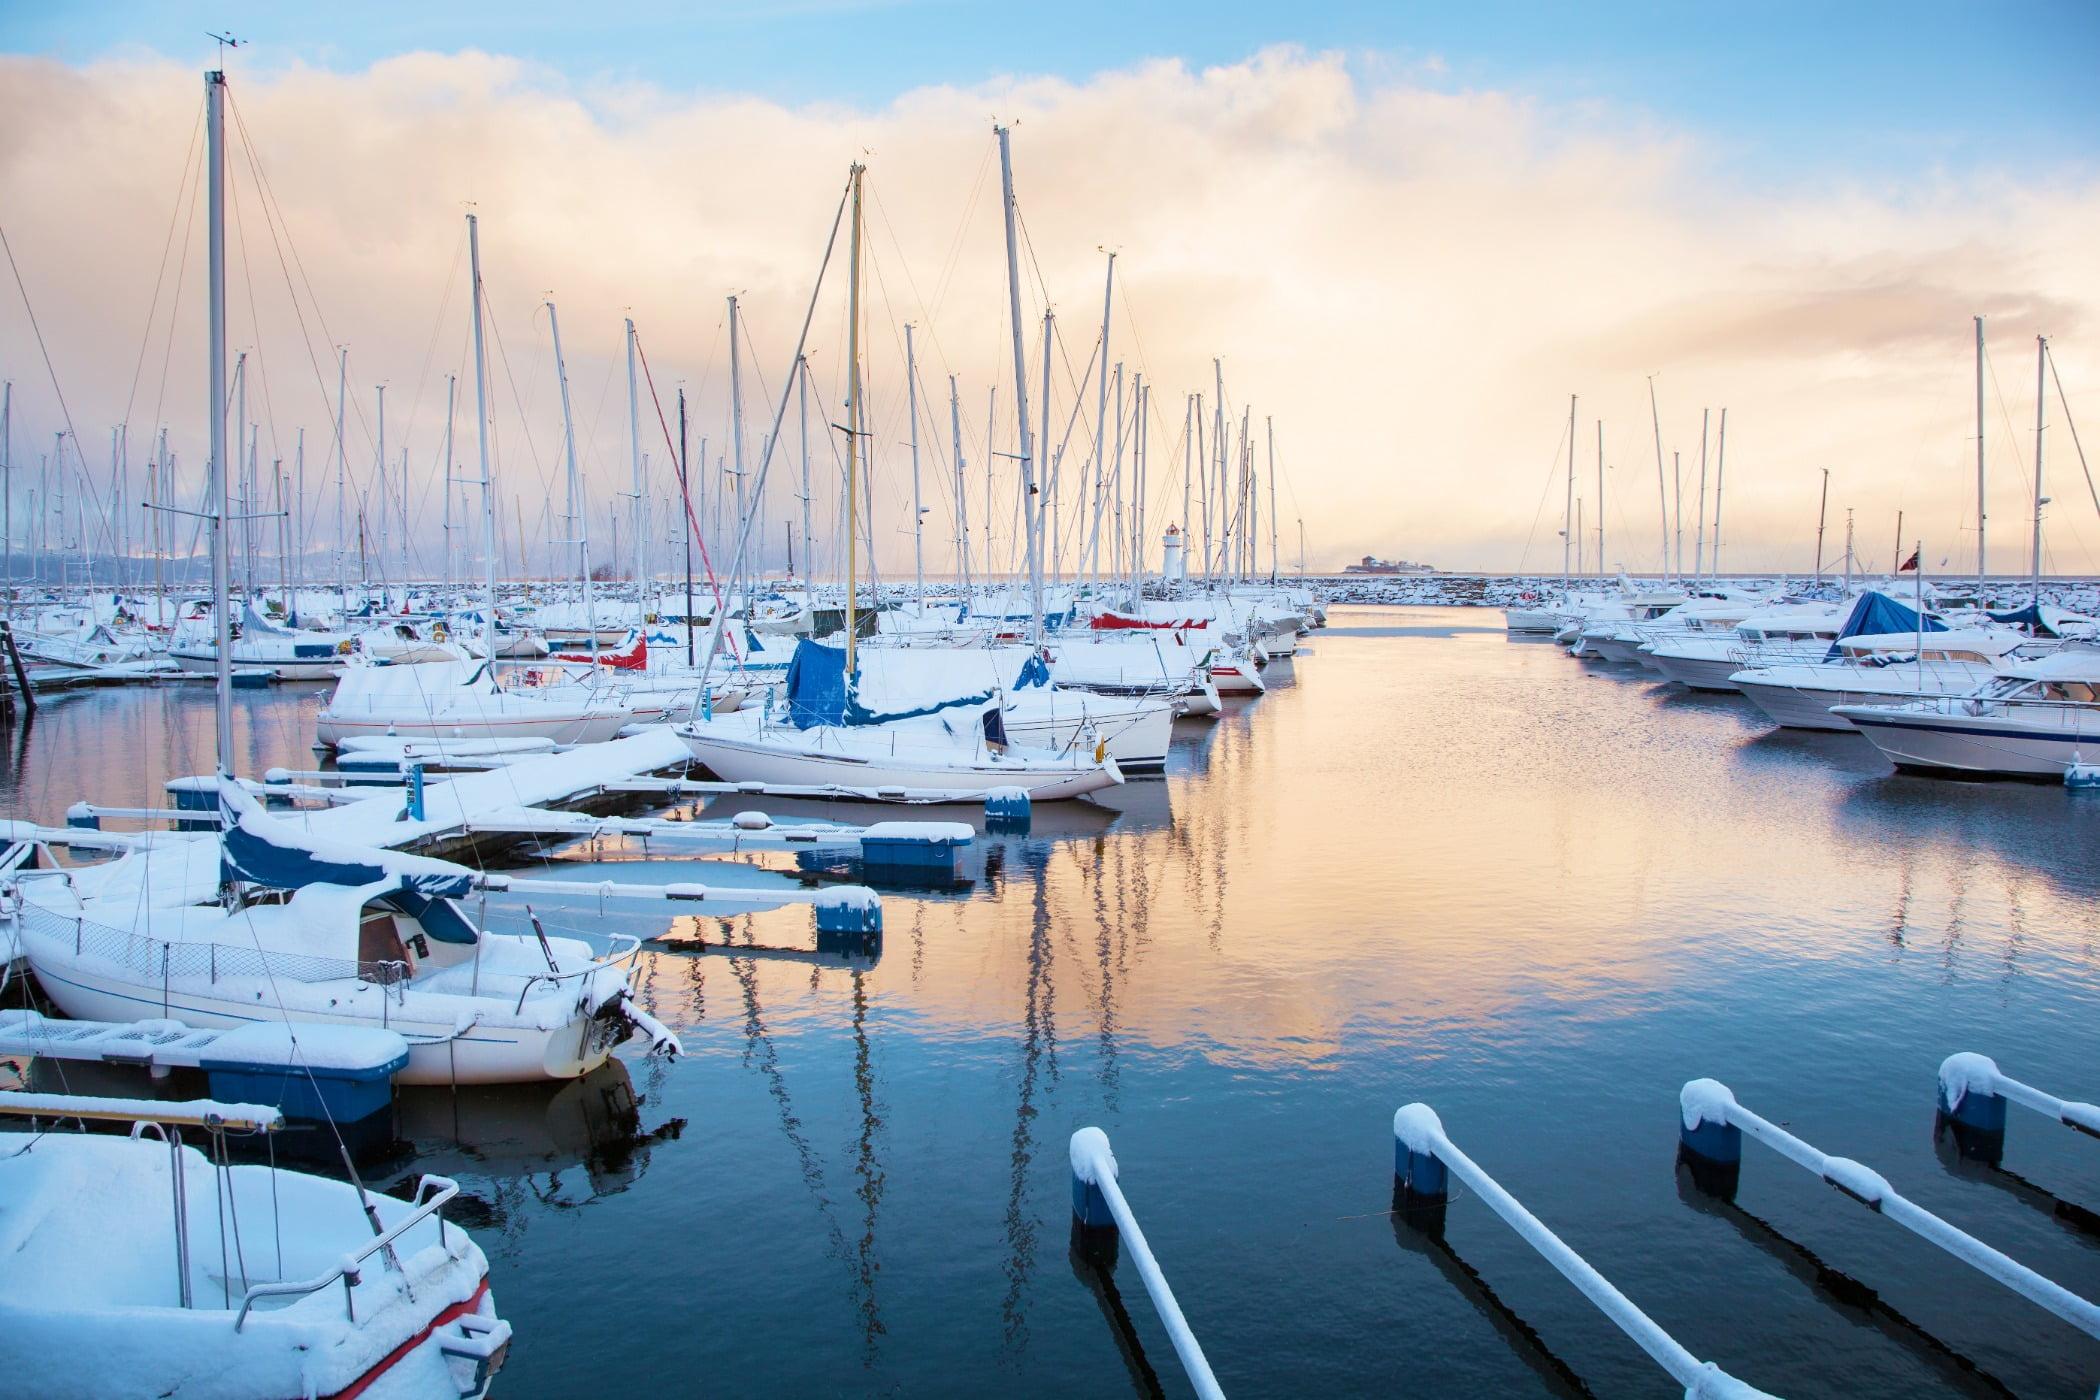 Boats and boating--Equipment and supplies, Ship, Mast, Port, Dock, Waterway, Boat, Harbor, Watercraft, Marina